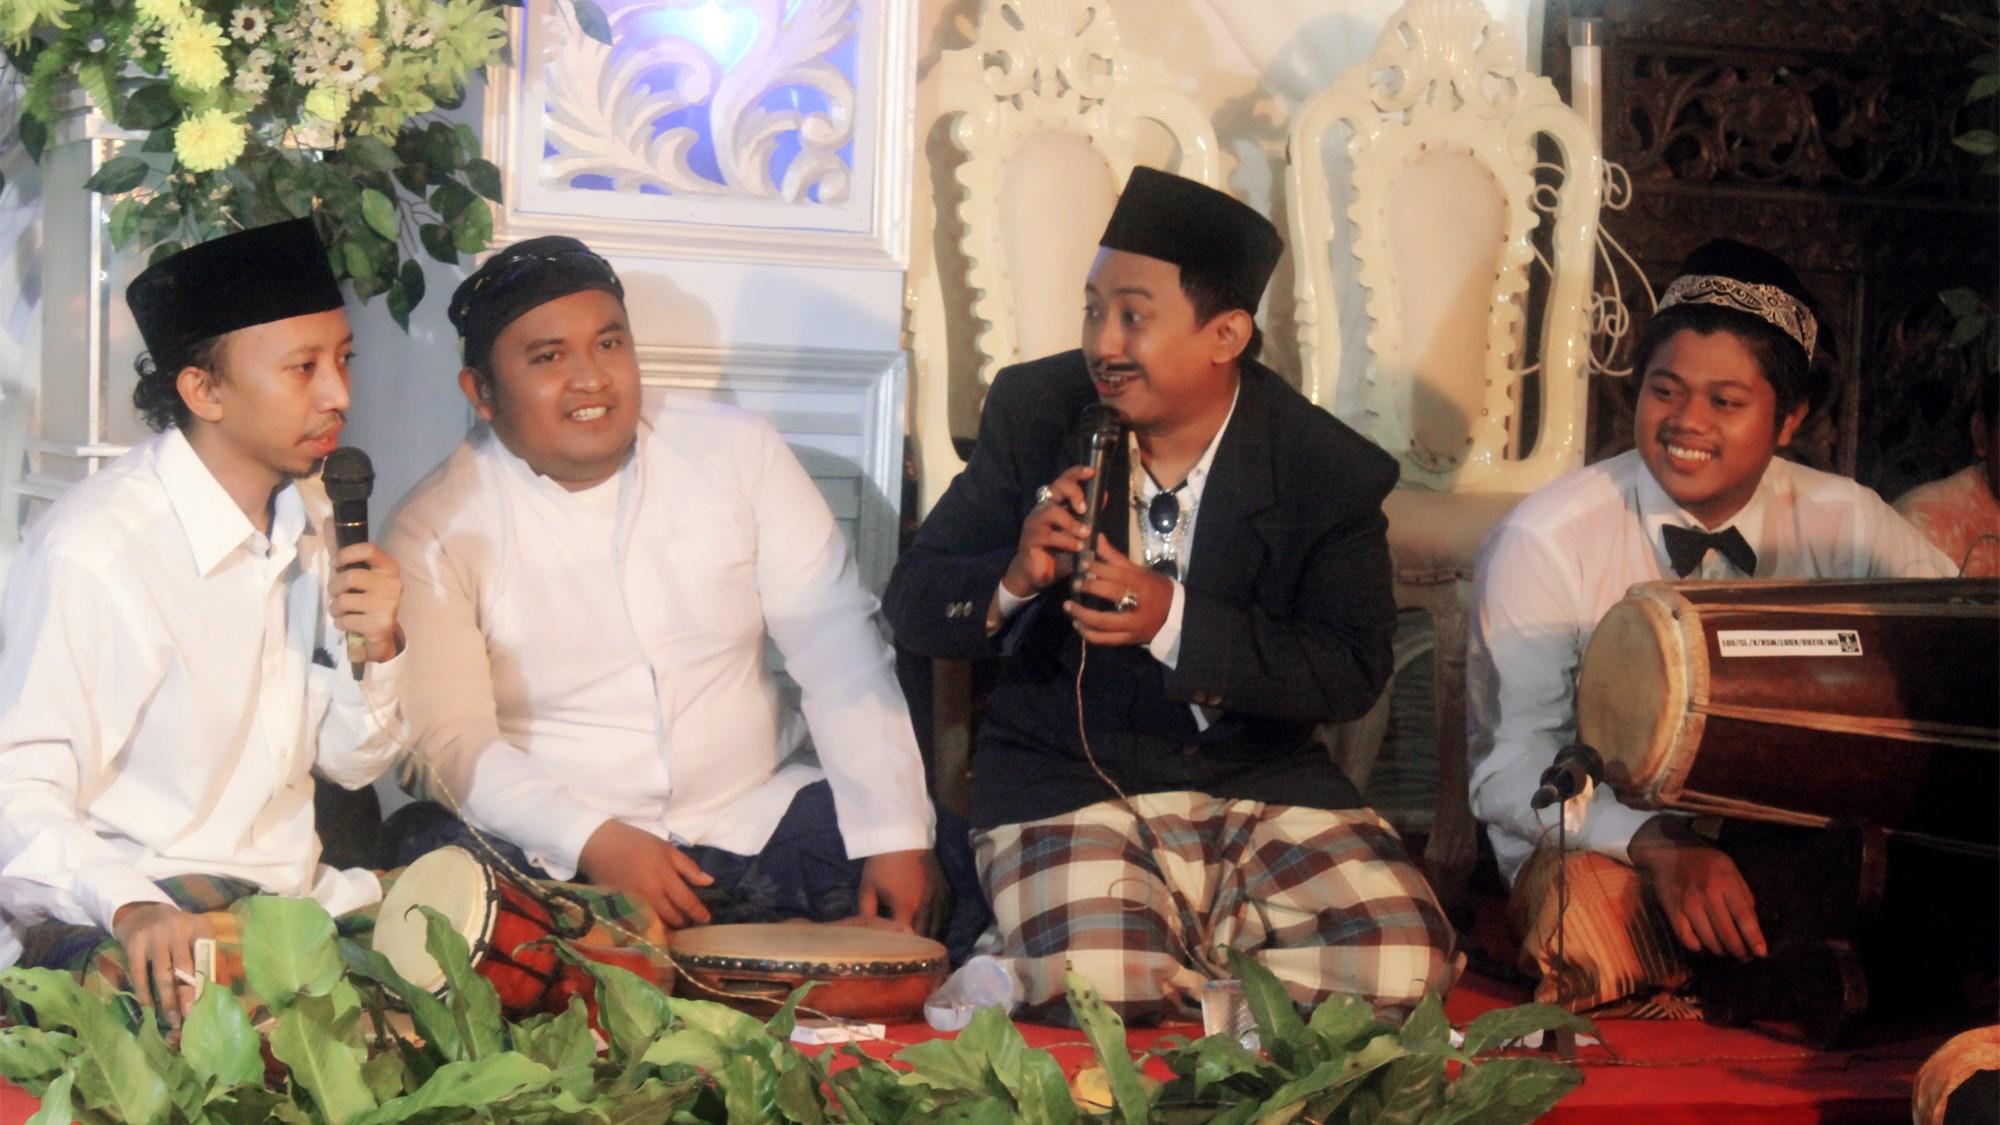 KluntrangKluntrung copy | Yayak Priasmara dan Nasib Seni Teater Tutur Kentrung